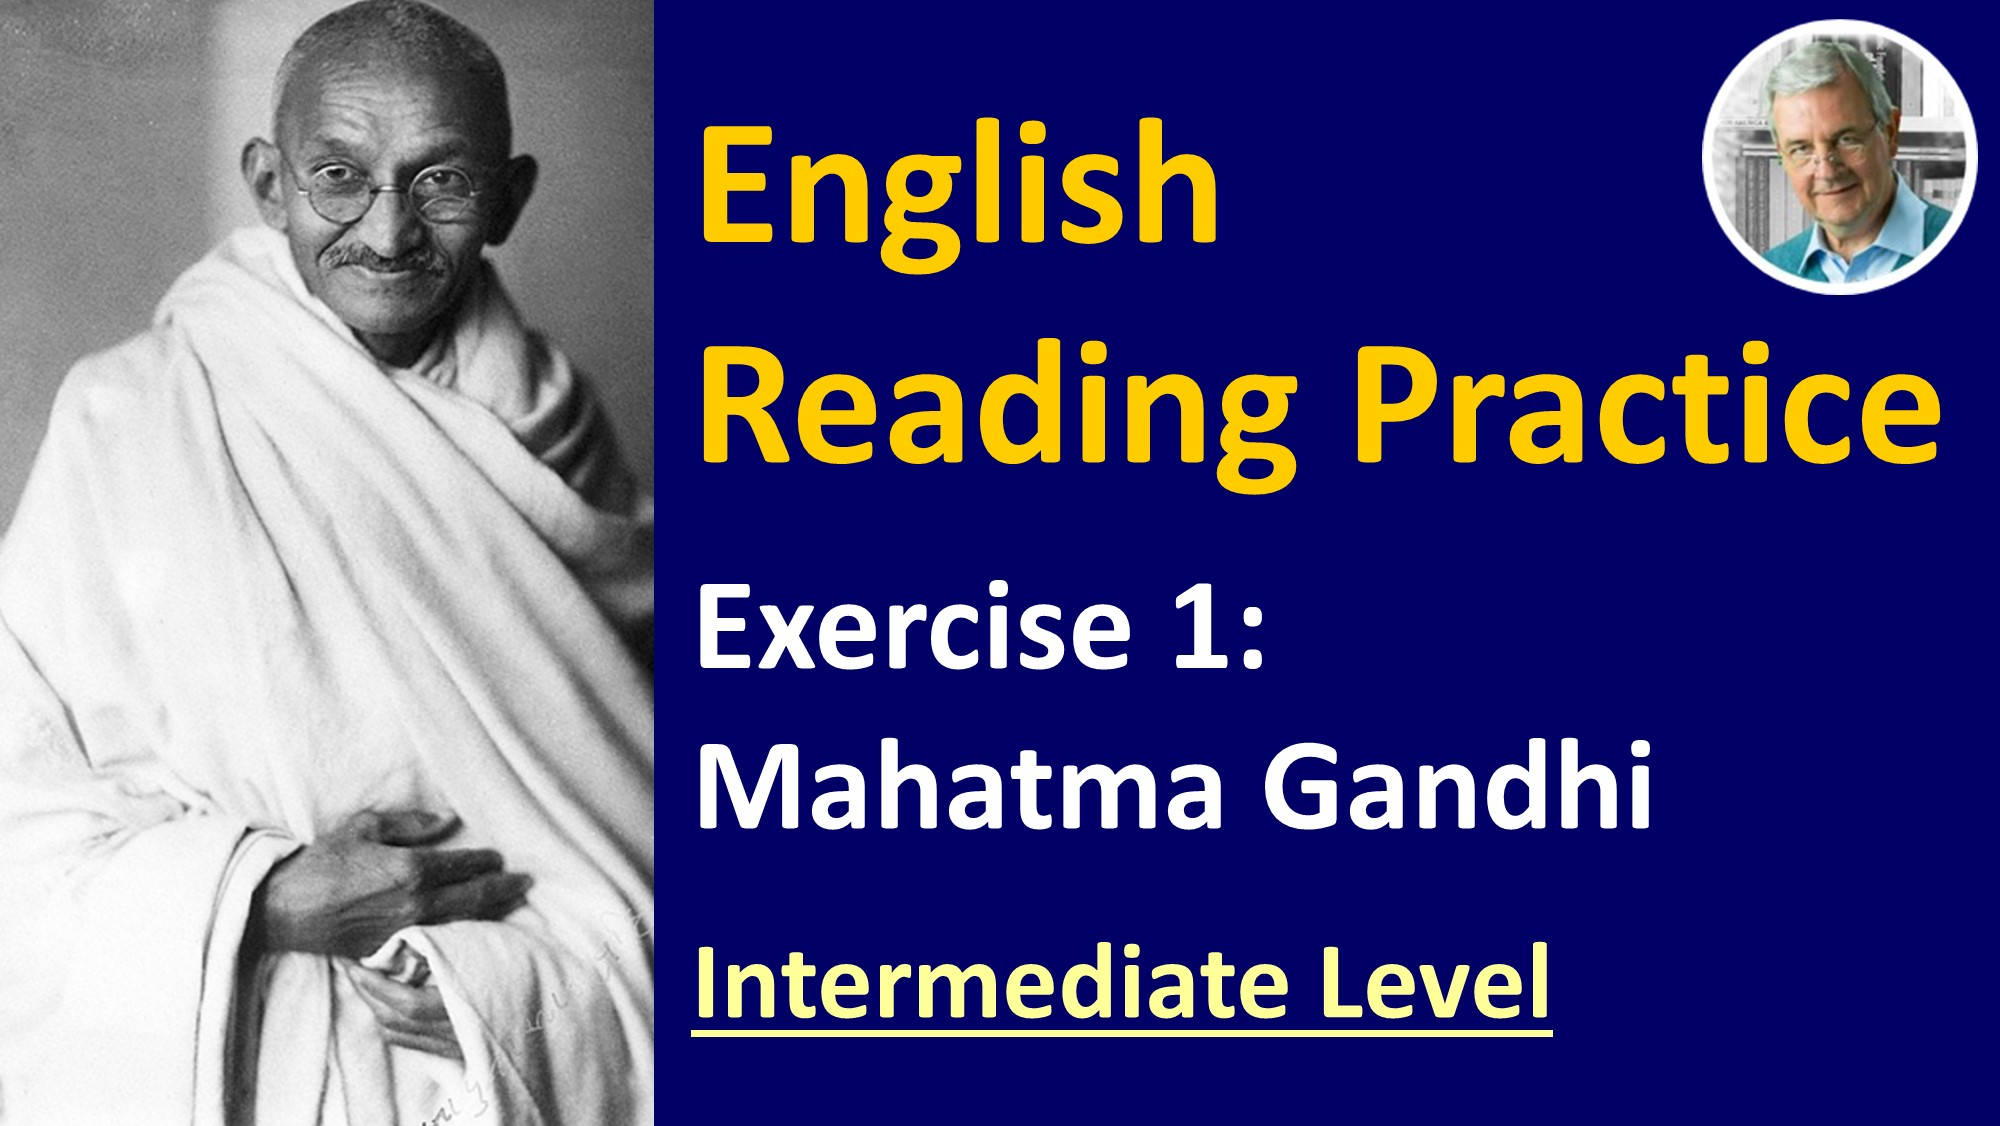 english reading exercise #1 intermediate